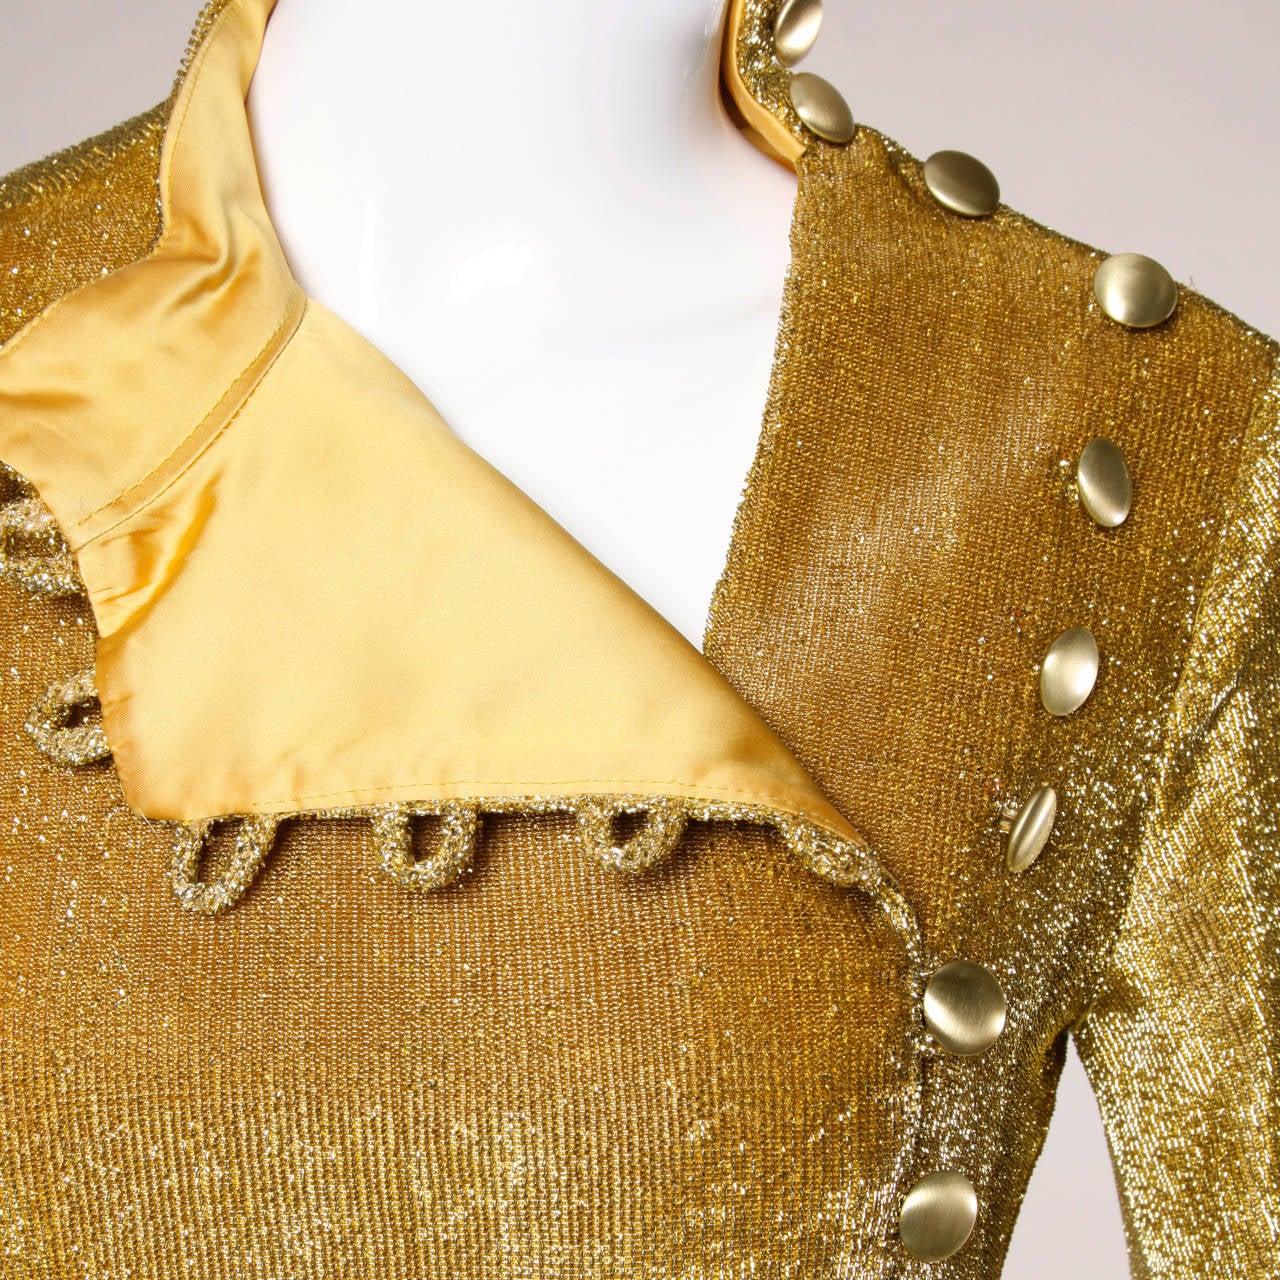 Mr. Mort Vintage 1960s Metallic Gold Lurex Coat Dress 8